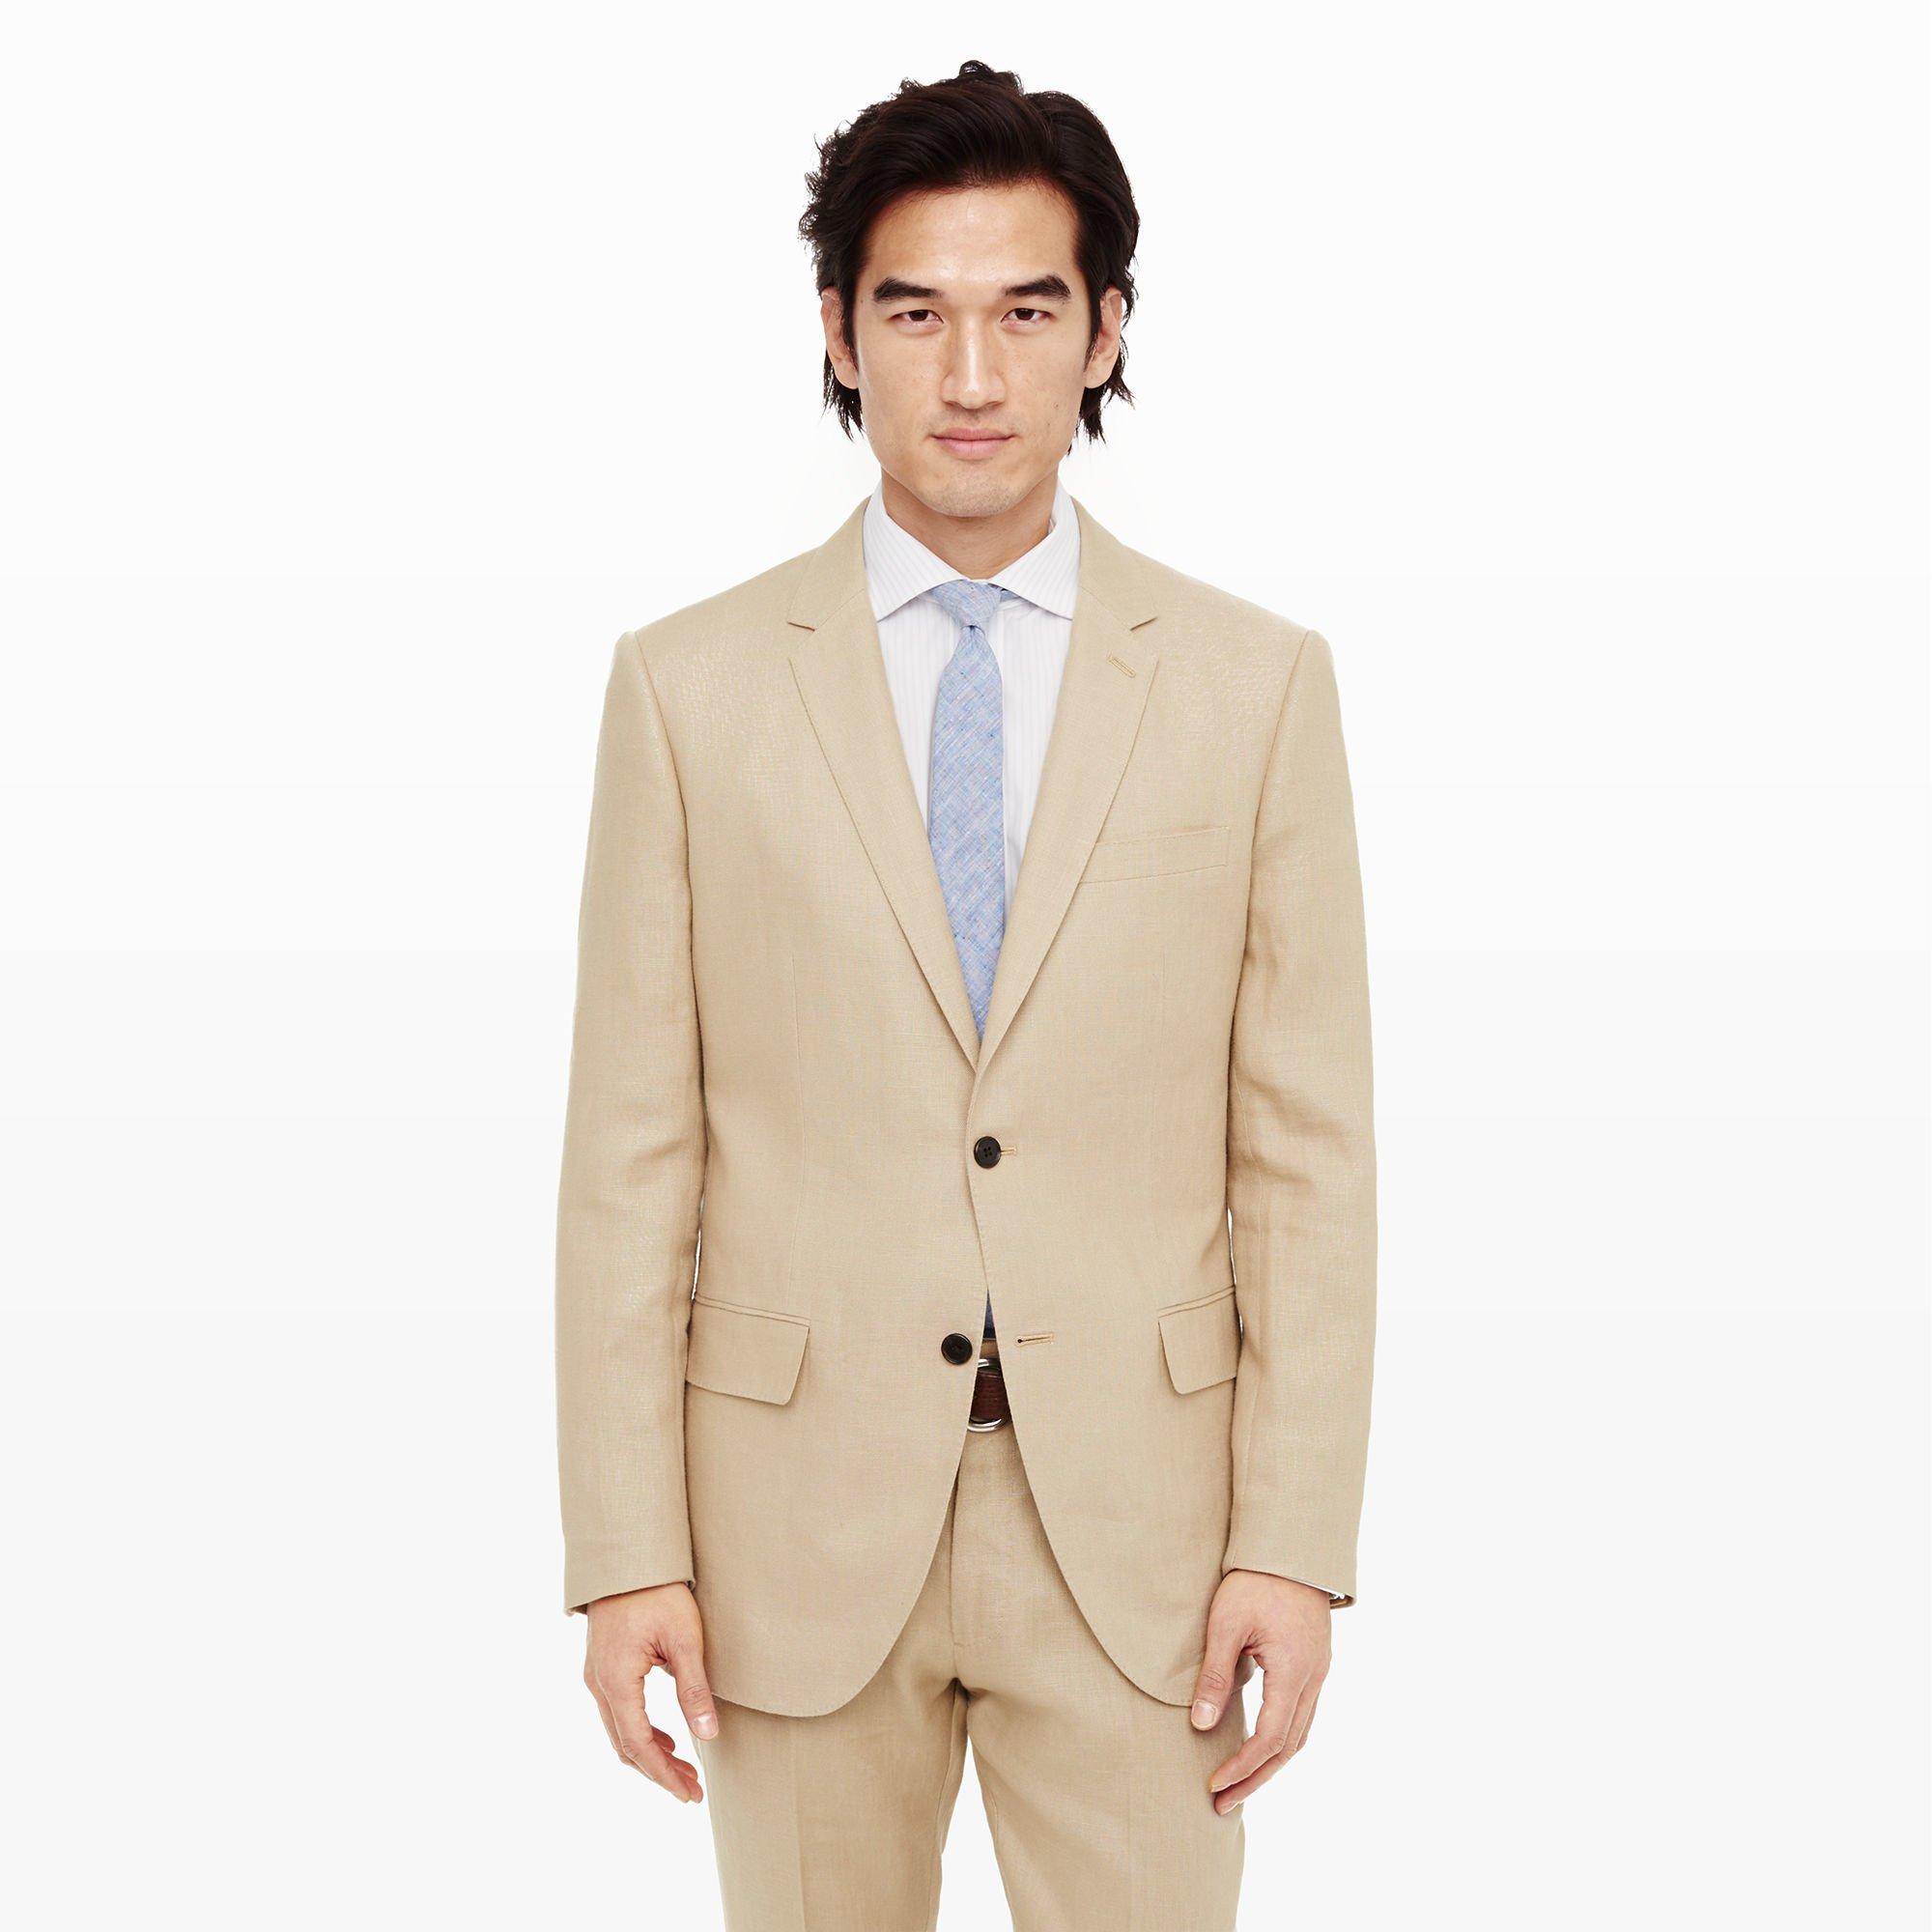 286ce2dead38 Club Monaco Grant Linen Suit Blazer in Natural for Men - Lyst